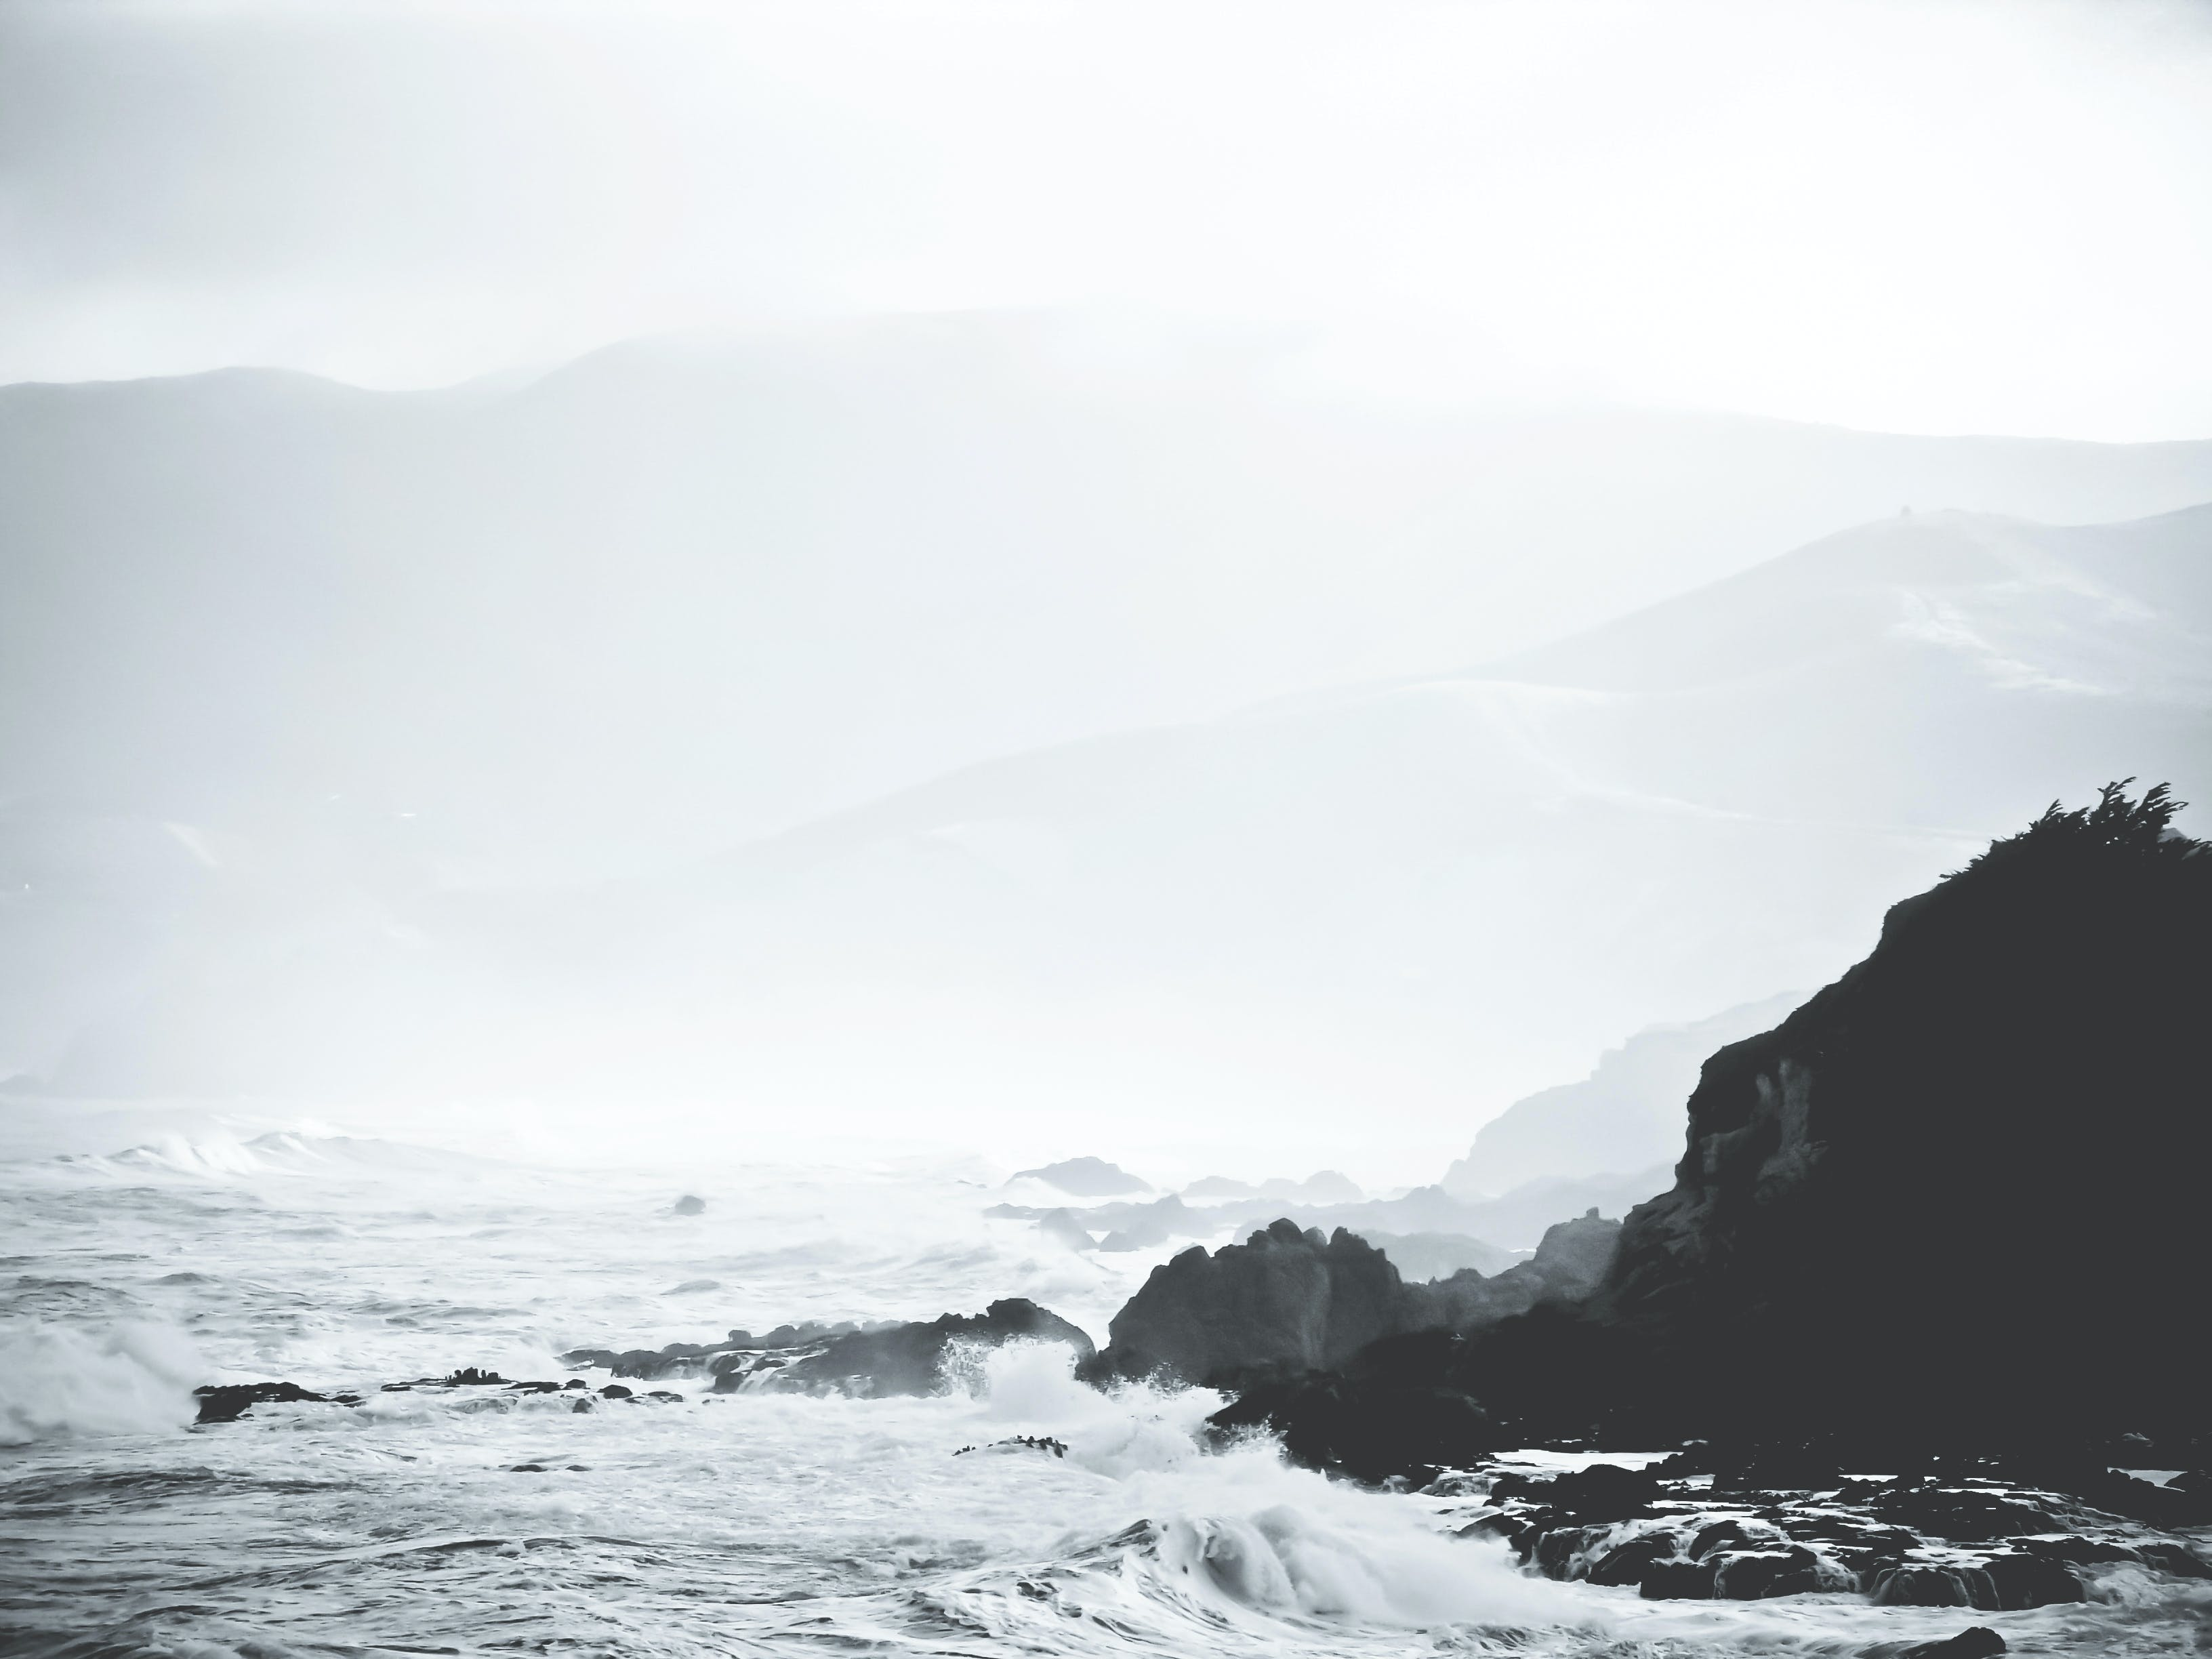 Free stock photo of sea, ocean, rocks, waves